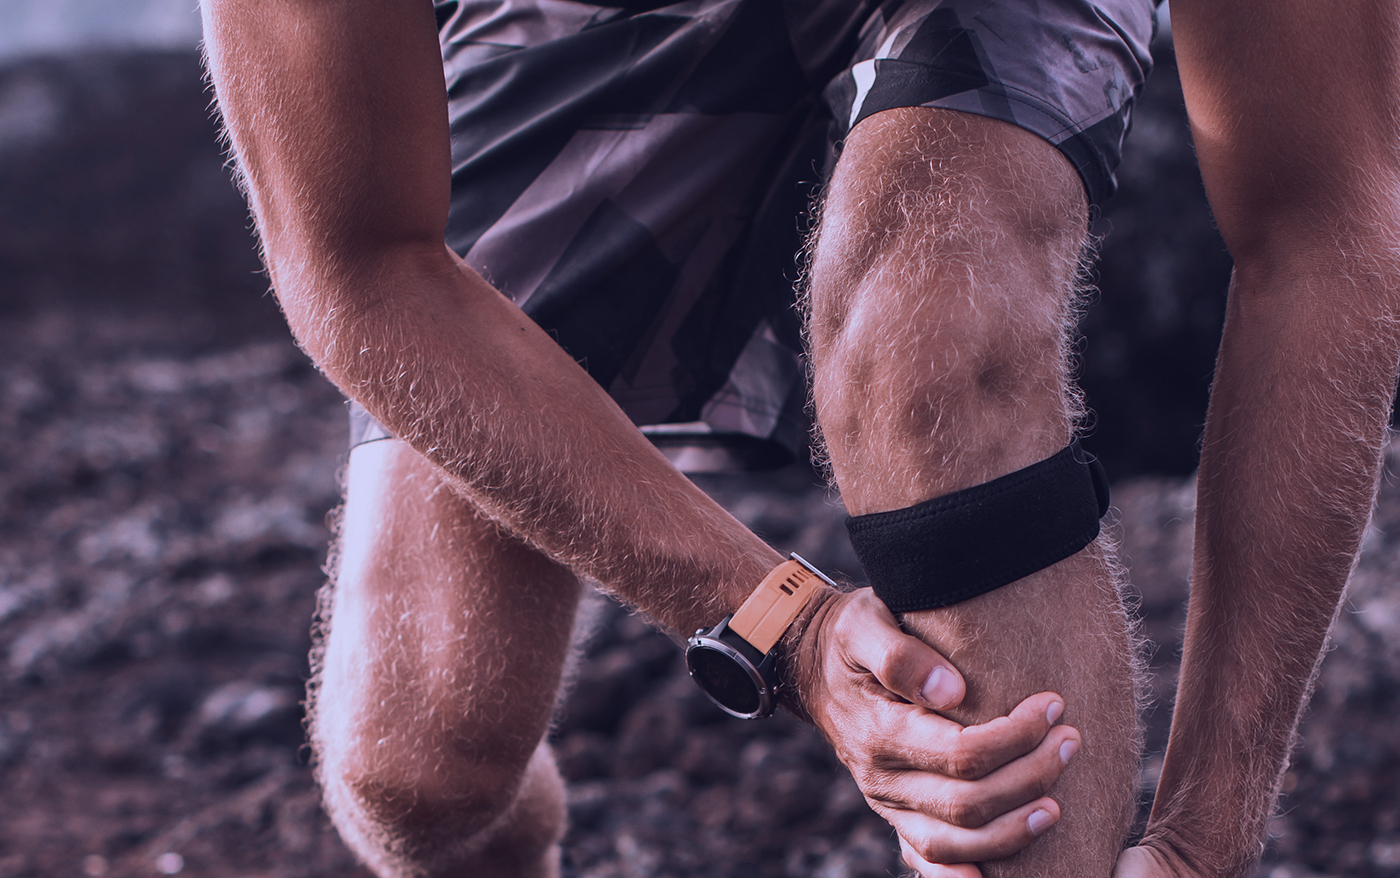 Bliv klogere på meniskskader   Fysioterapi i Eventyrsport